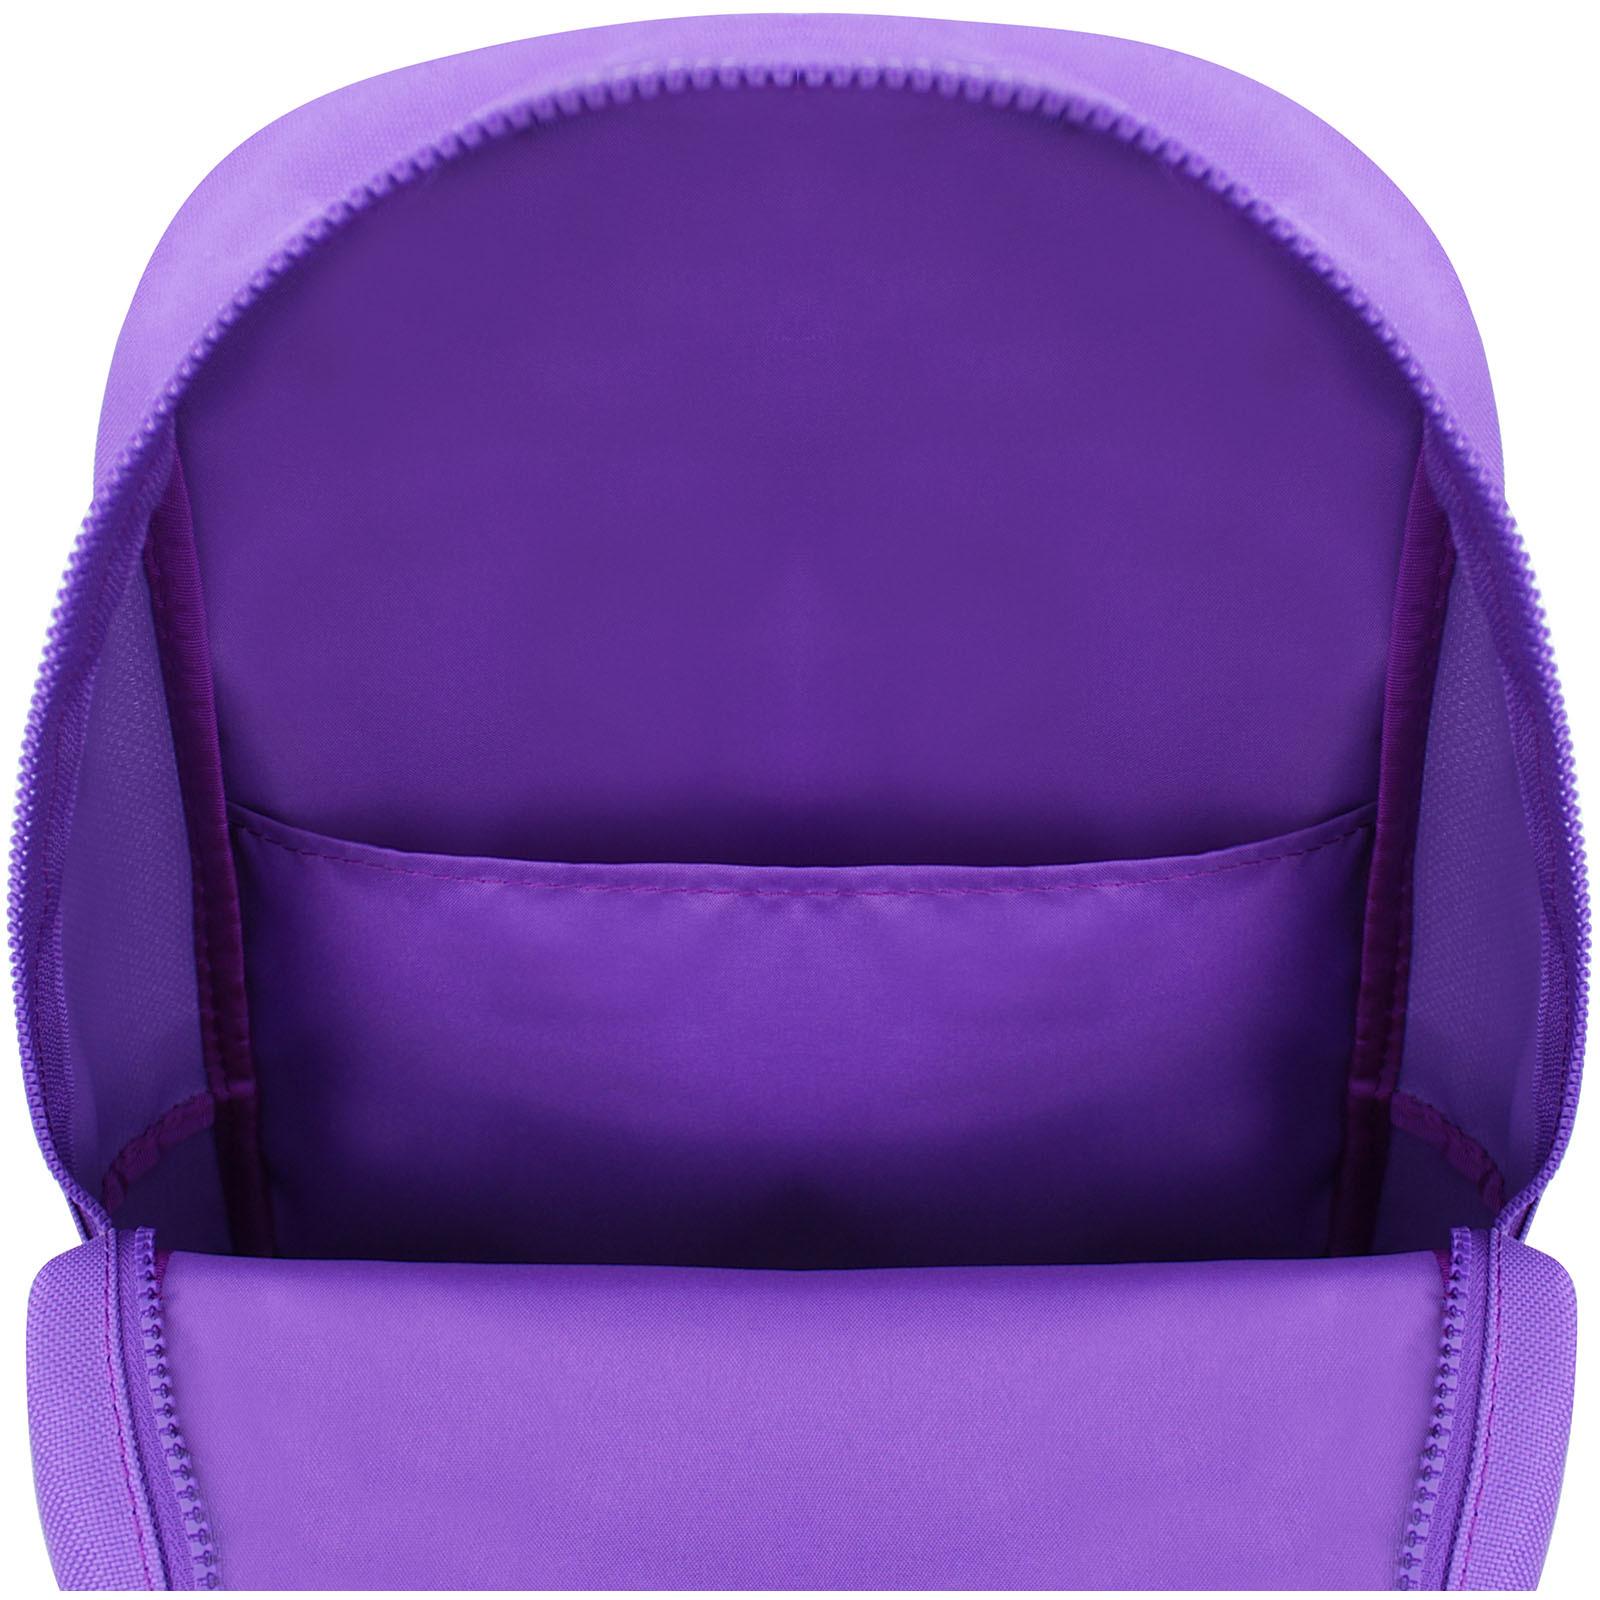 Рюкзак Bagland Amber 15 л. фиолетовый/электрик (0010466) фото 4